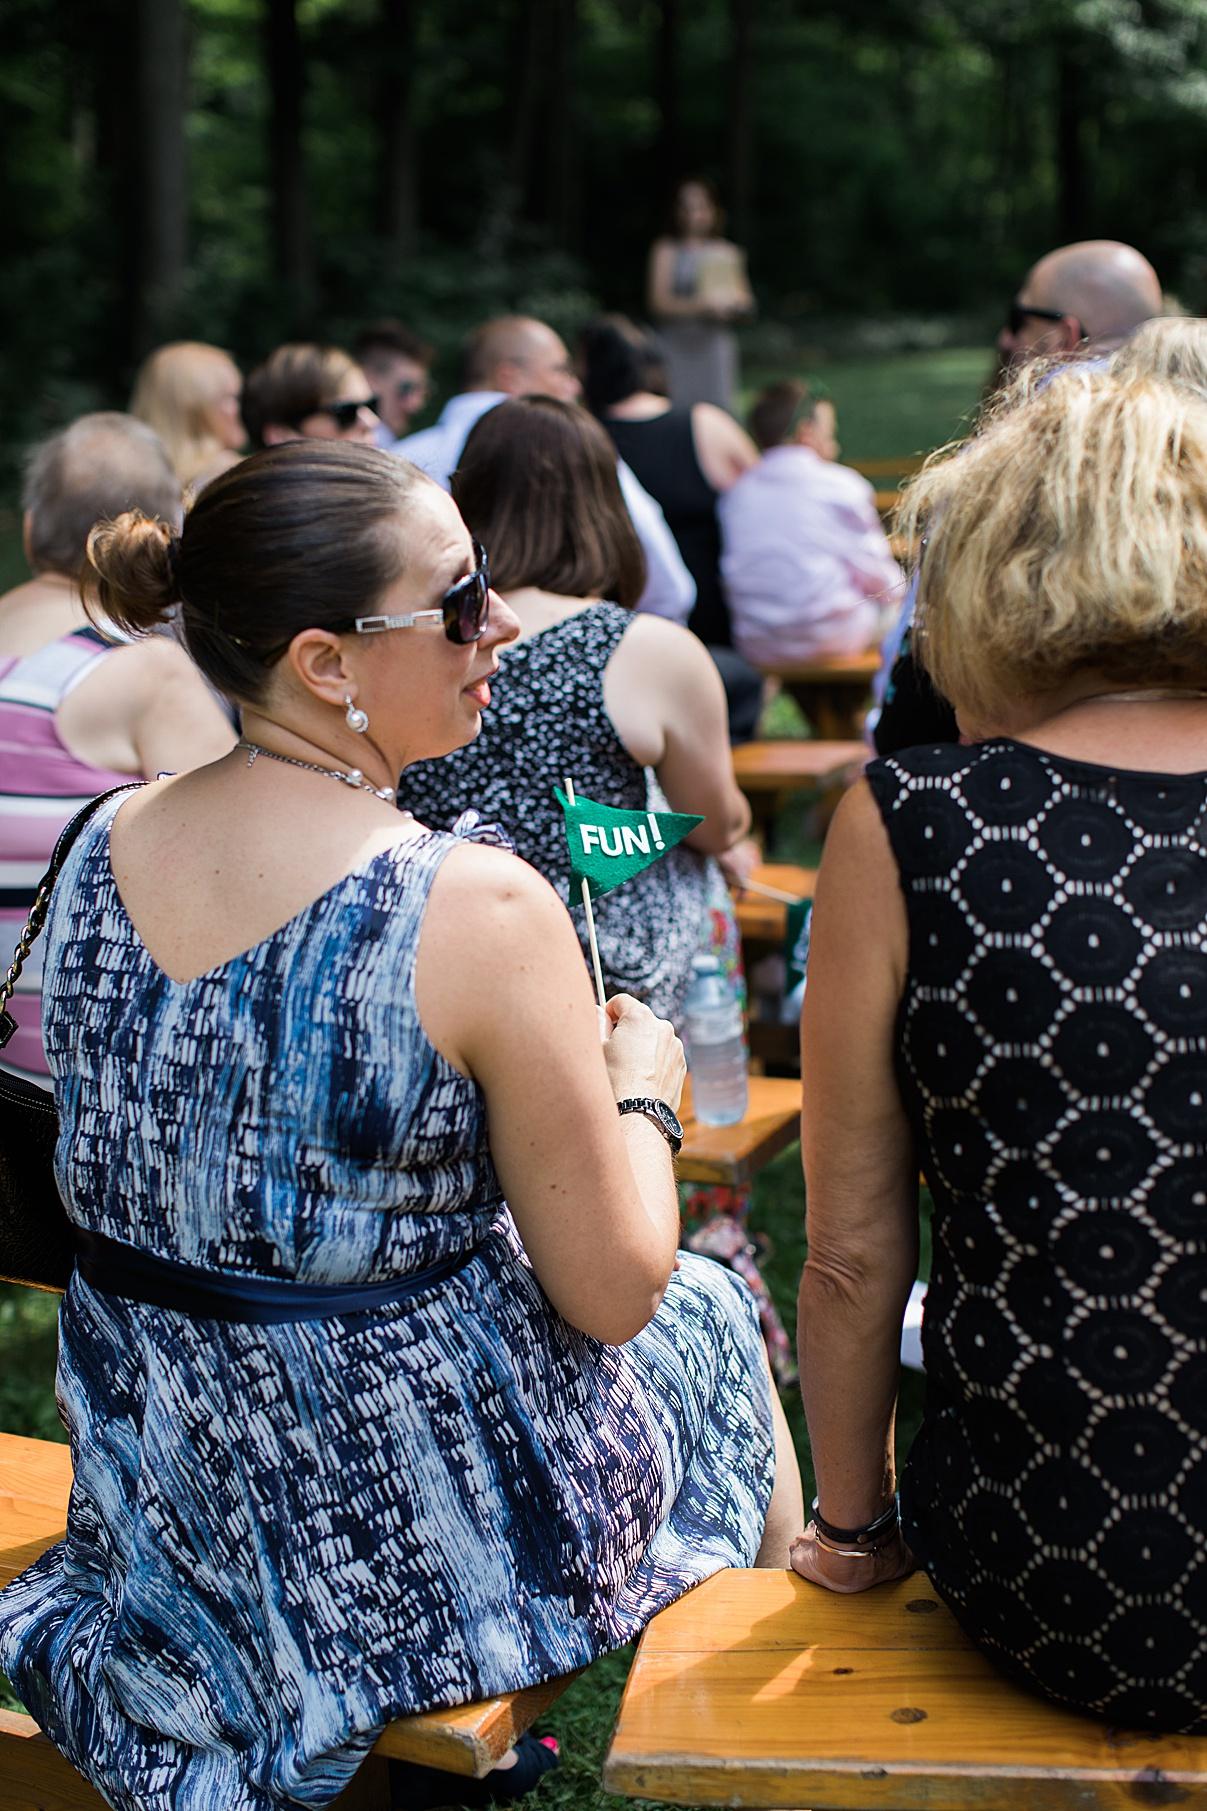 Guest holding fun flag at Balls Falls Ontario Wedding  Balls Falls  Ontario Wedding  Ontario Wedding Photographer  Toronto Wedding Photographer  3Photography   3photography.ca